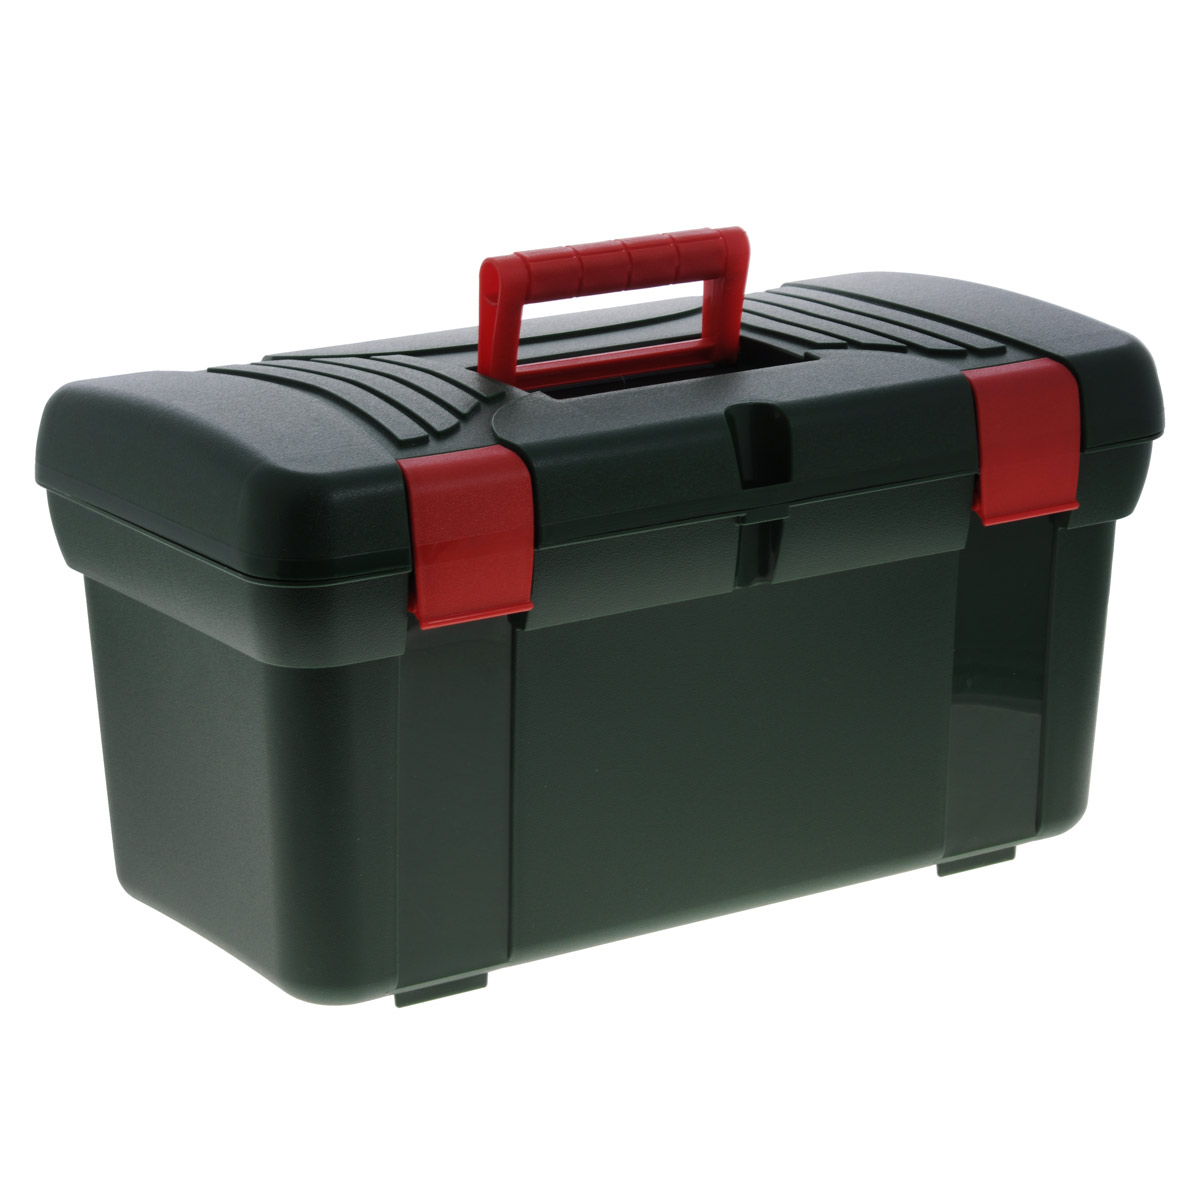 Ящик Универсал, 50 х 26 х 27 см ящик для инструментов stanley 20 50 х 28 х 21 см